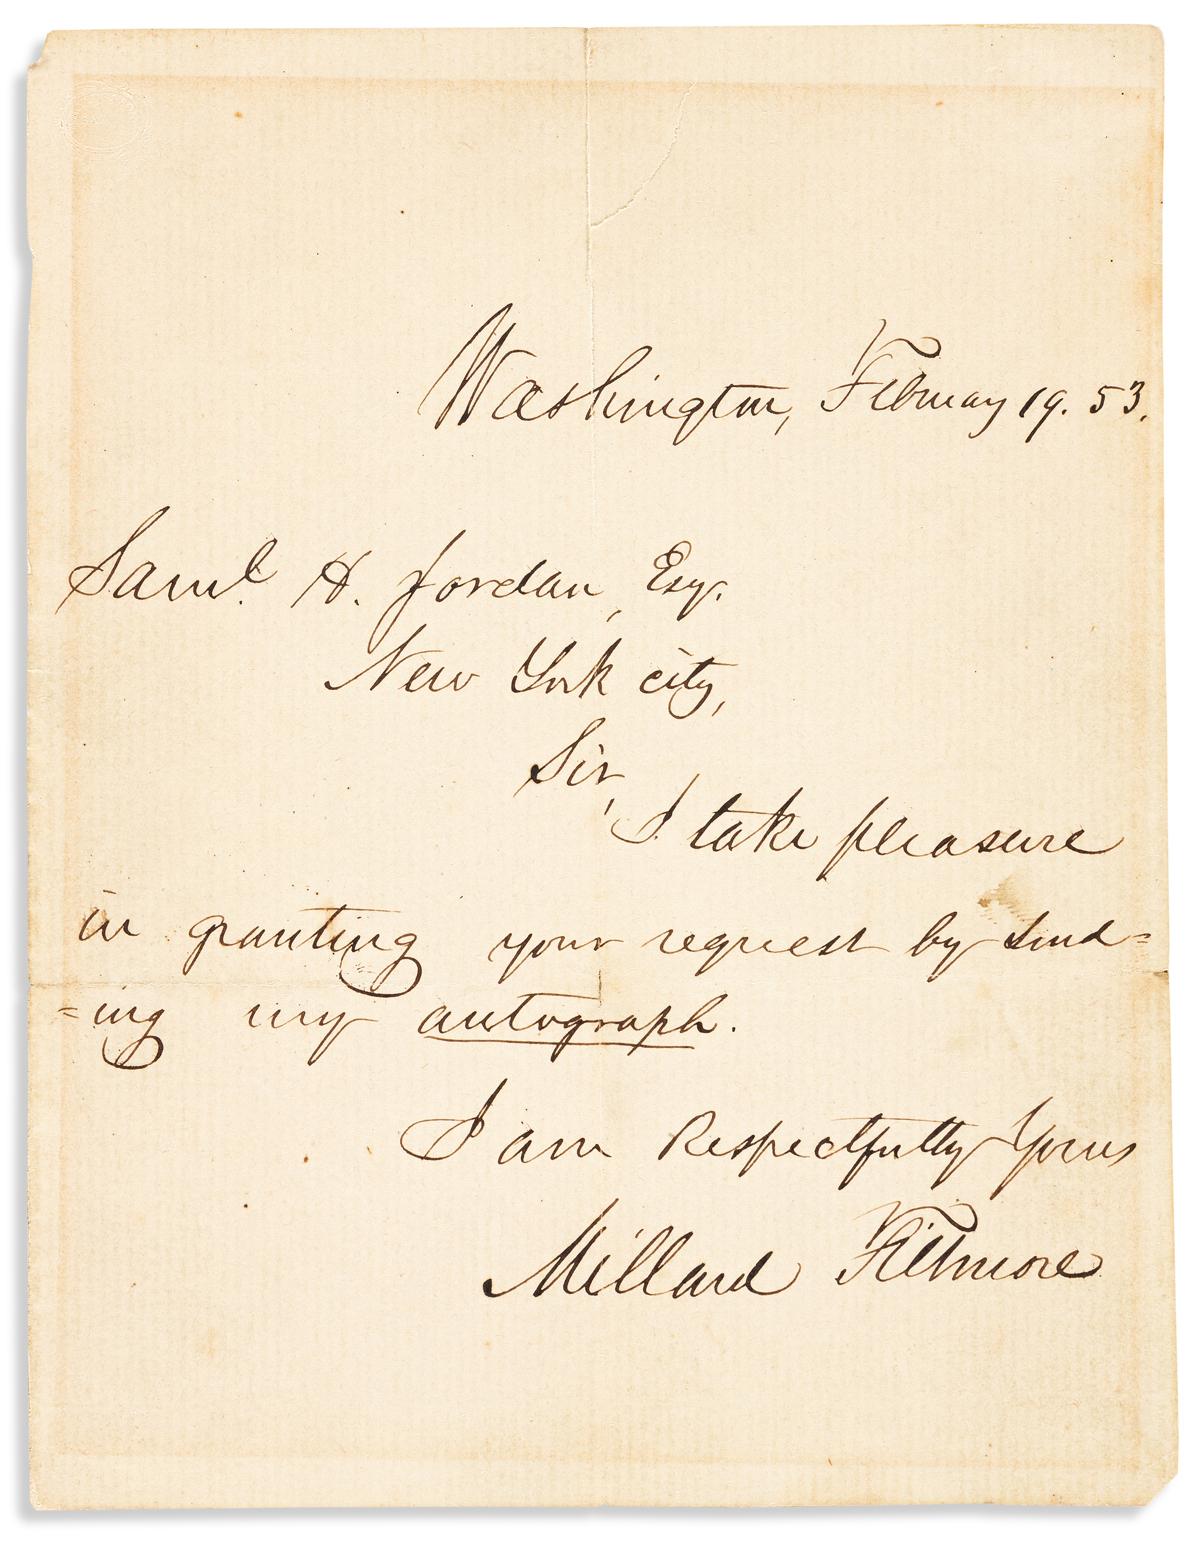 FILLMORE, MILLARD. Brief Autograph Letter Signed, as President, to Samuel H. Jordan, sending his autograph.